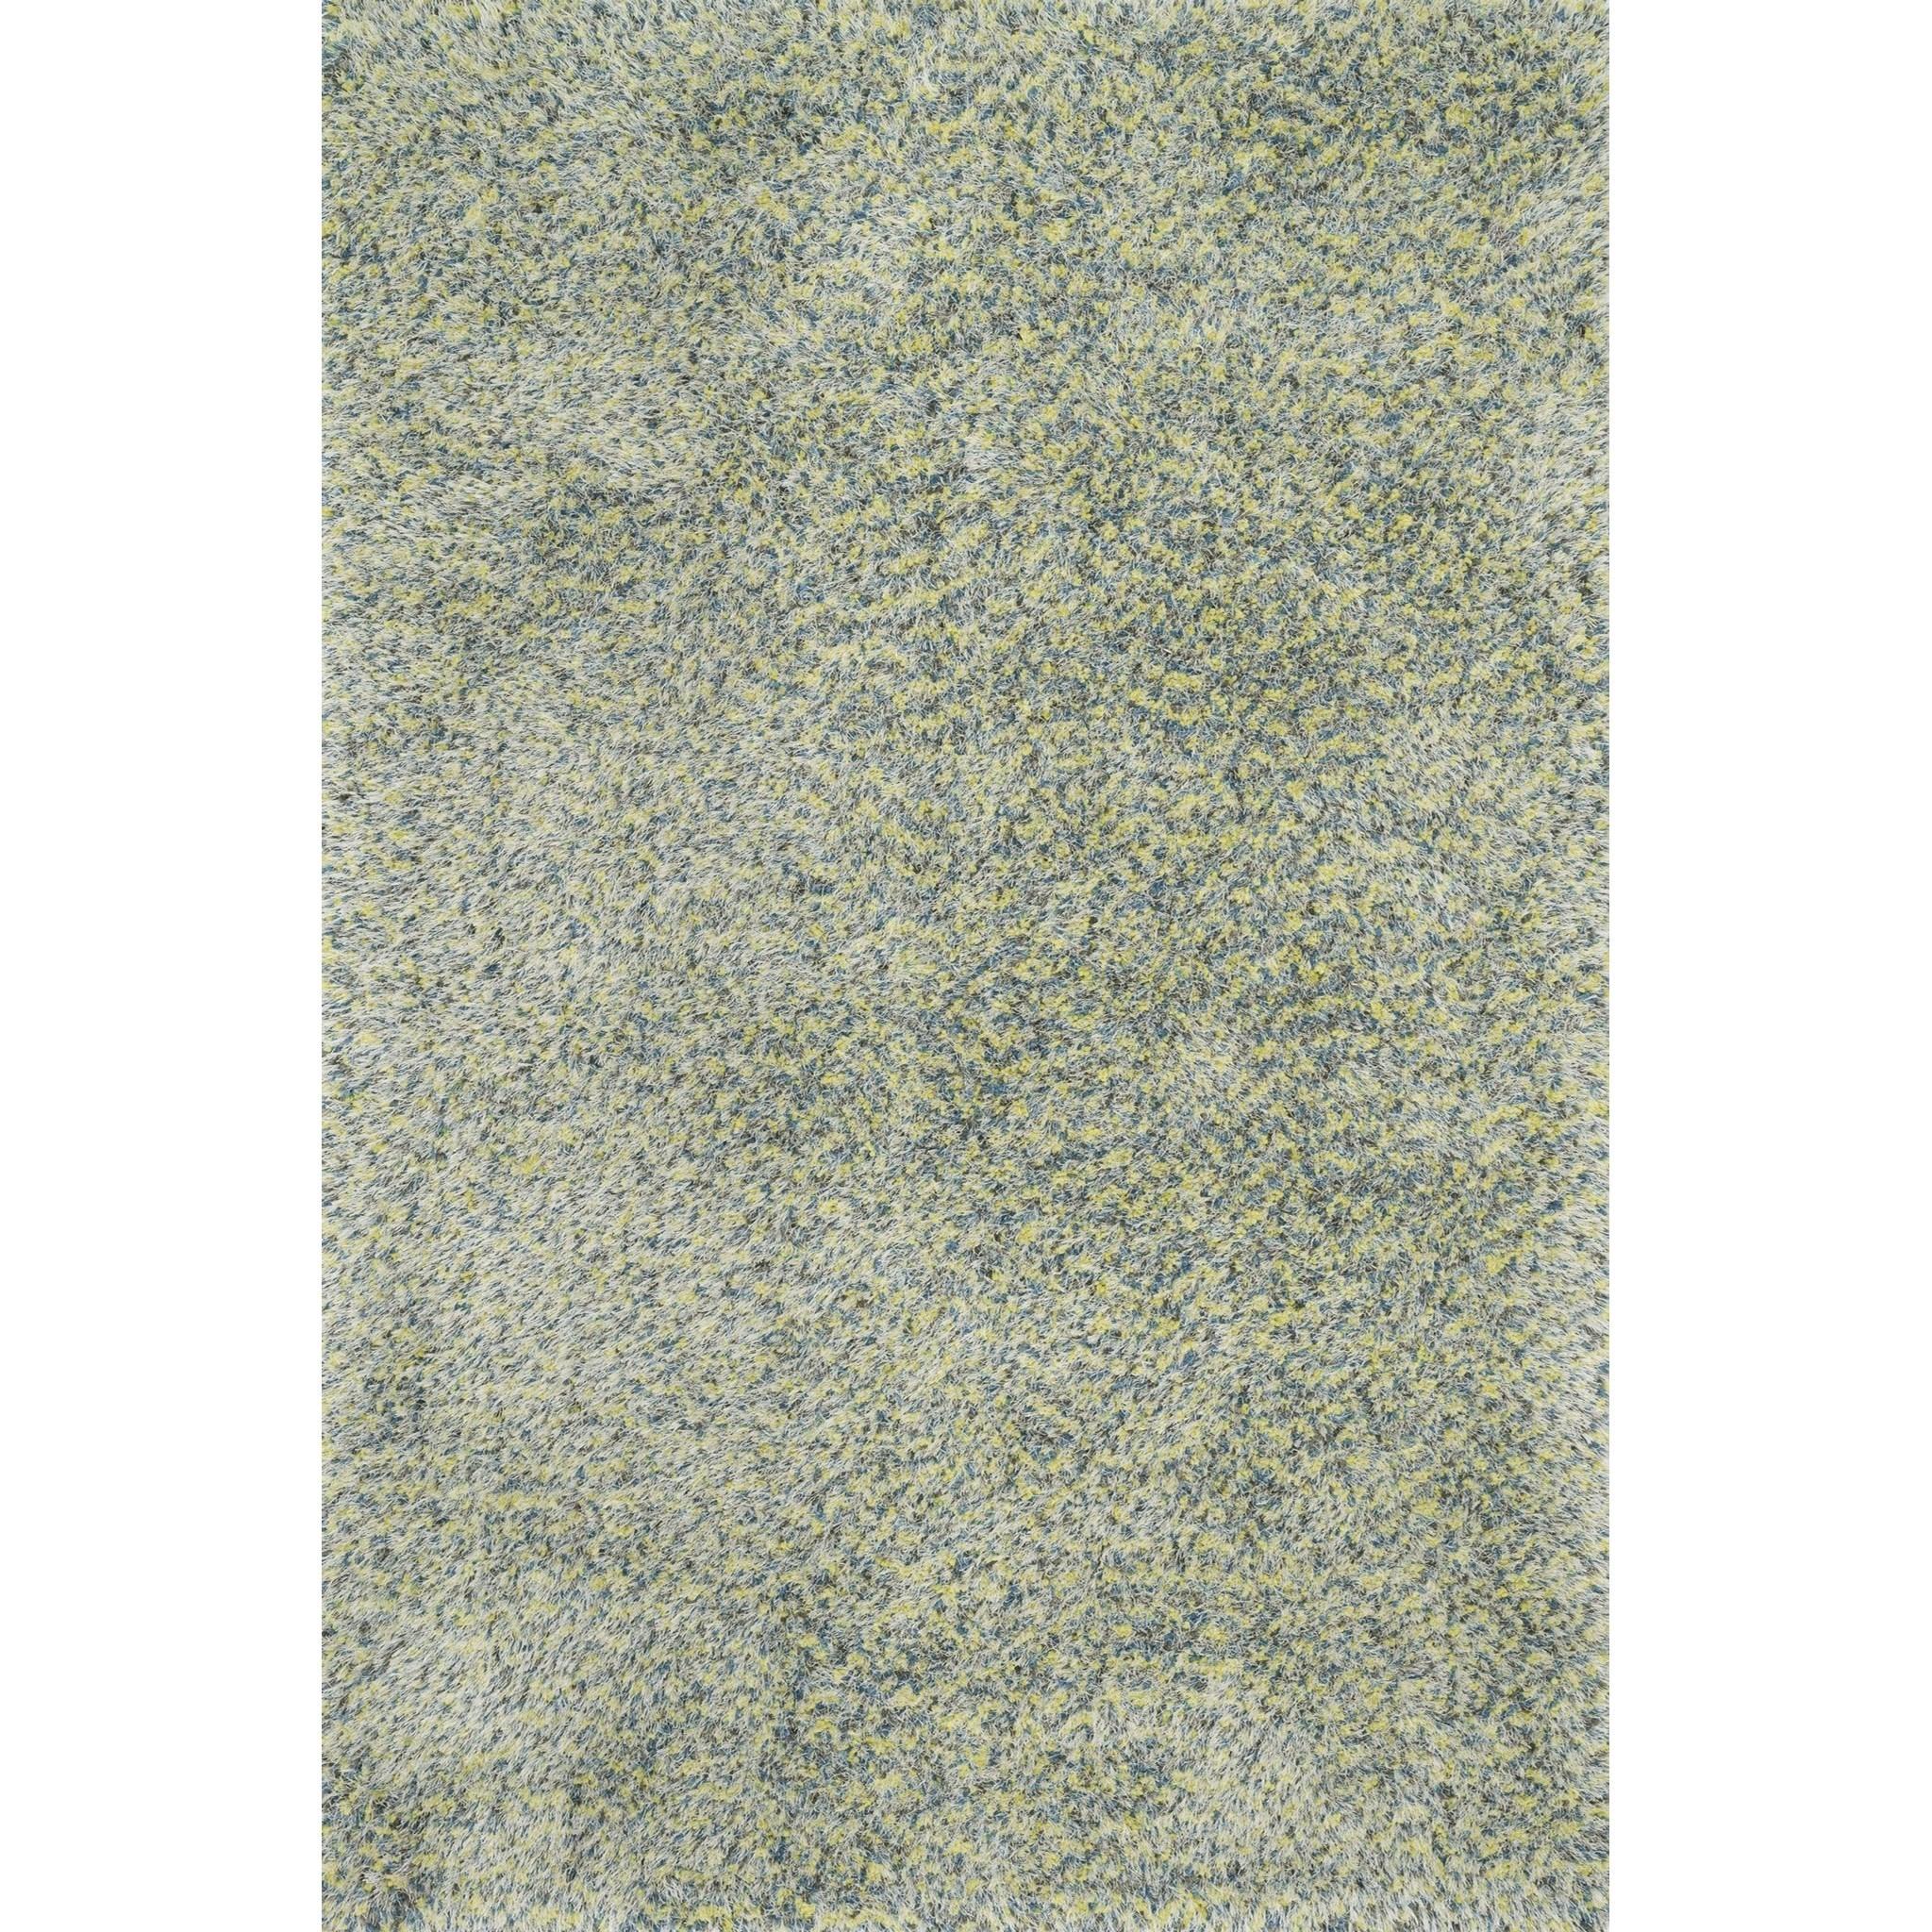 "Callie Shag 2'-3"" x 3'-9"" Area Rug by Loloi Rugs at Virginia Furniture Market"